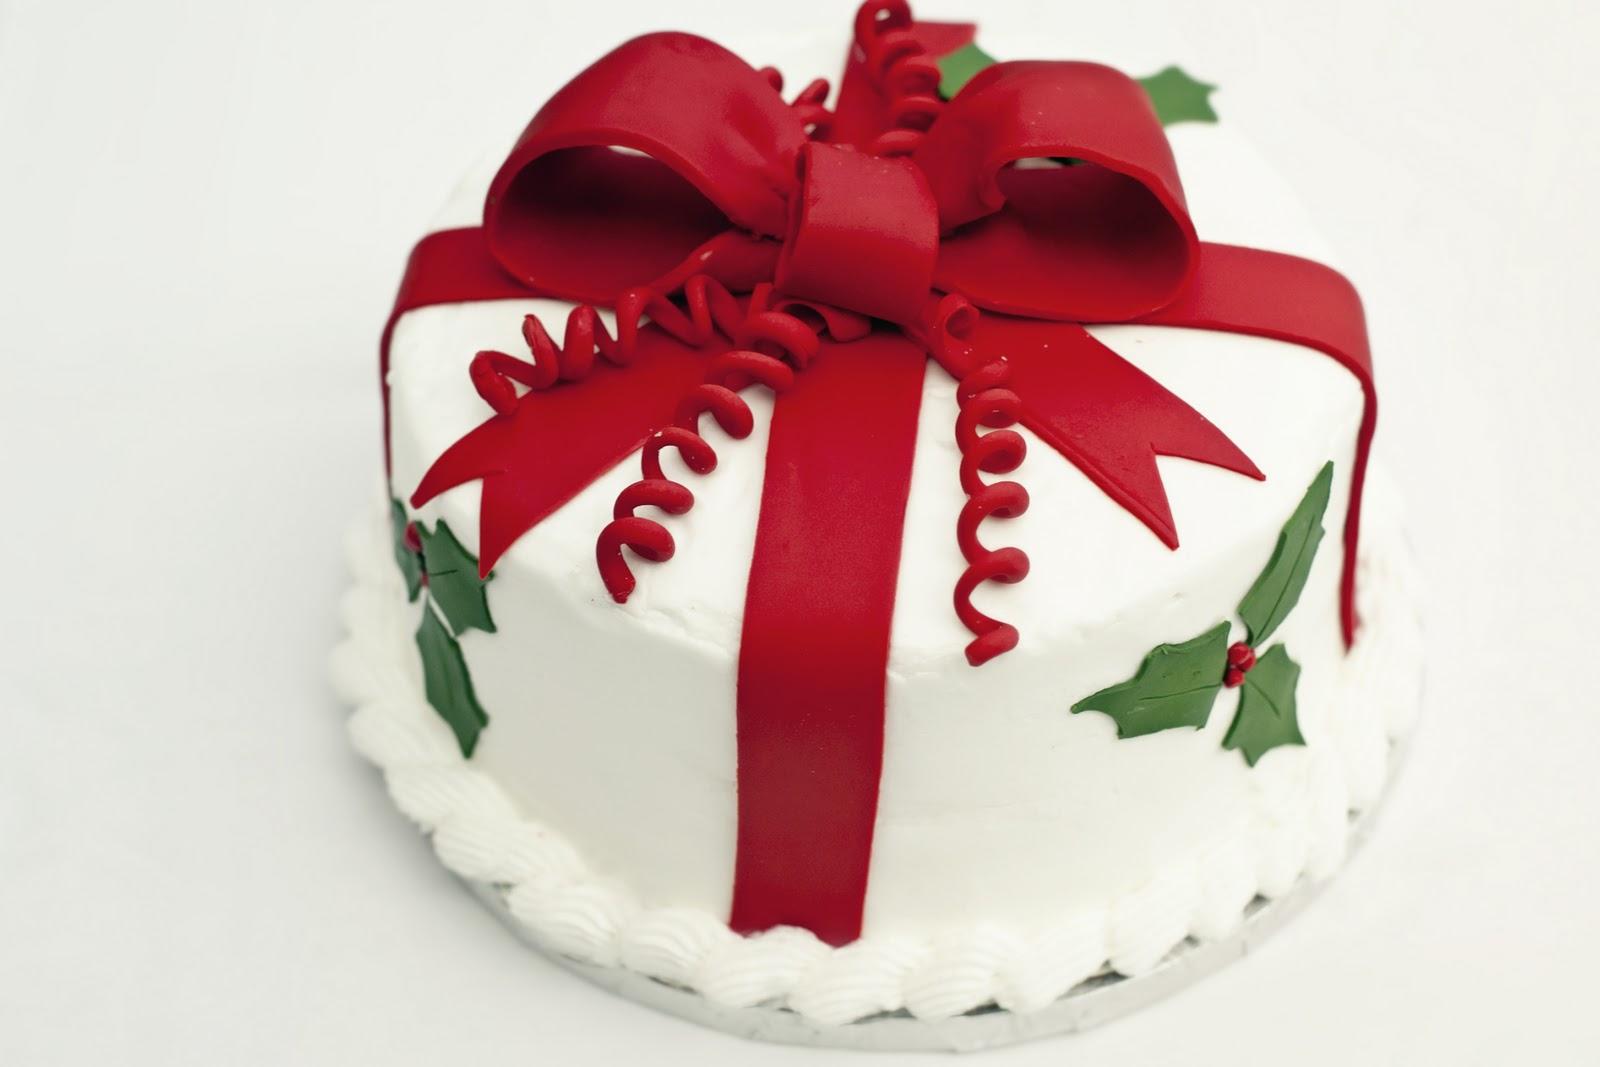 Fondant Cake For Christmas : PattiCakes!: Christmas Cake